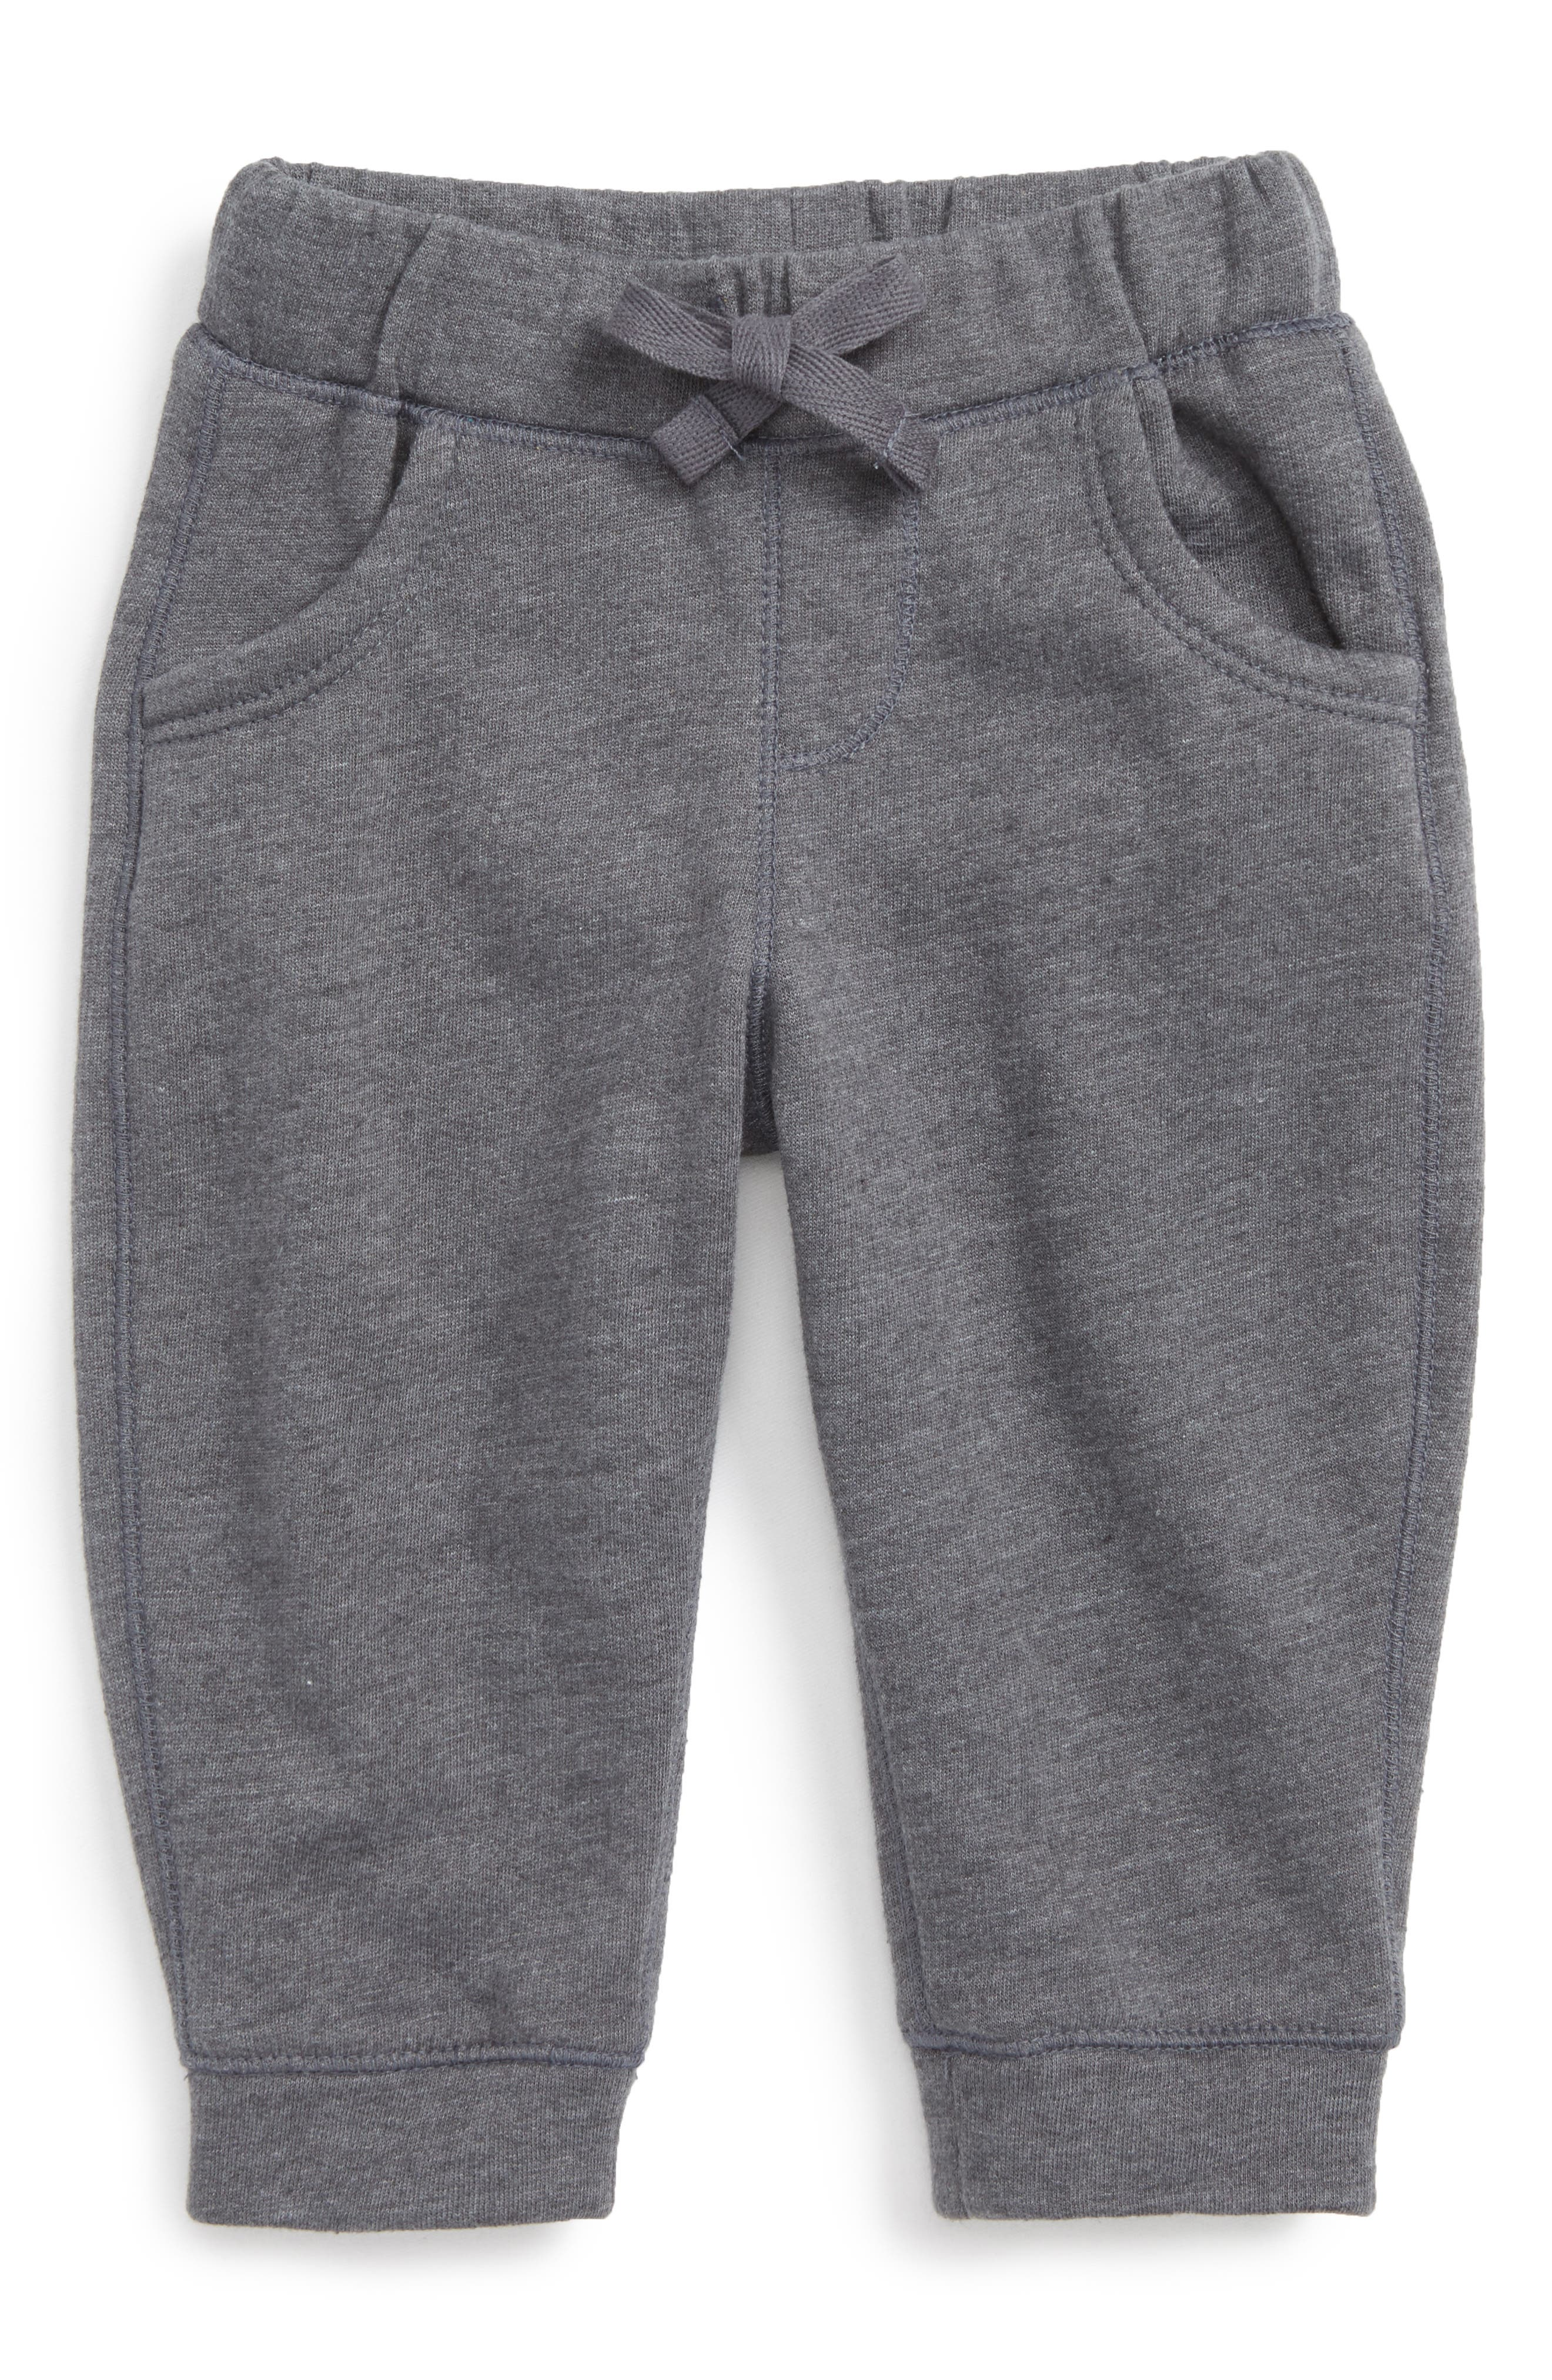 Fleece Sweatpants,                             Main thumbnail 1, color,                             GREY CHARCOAL HEATHER